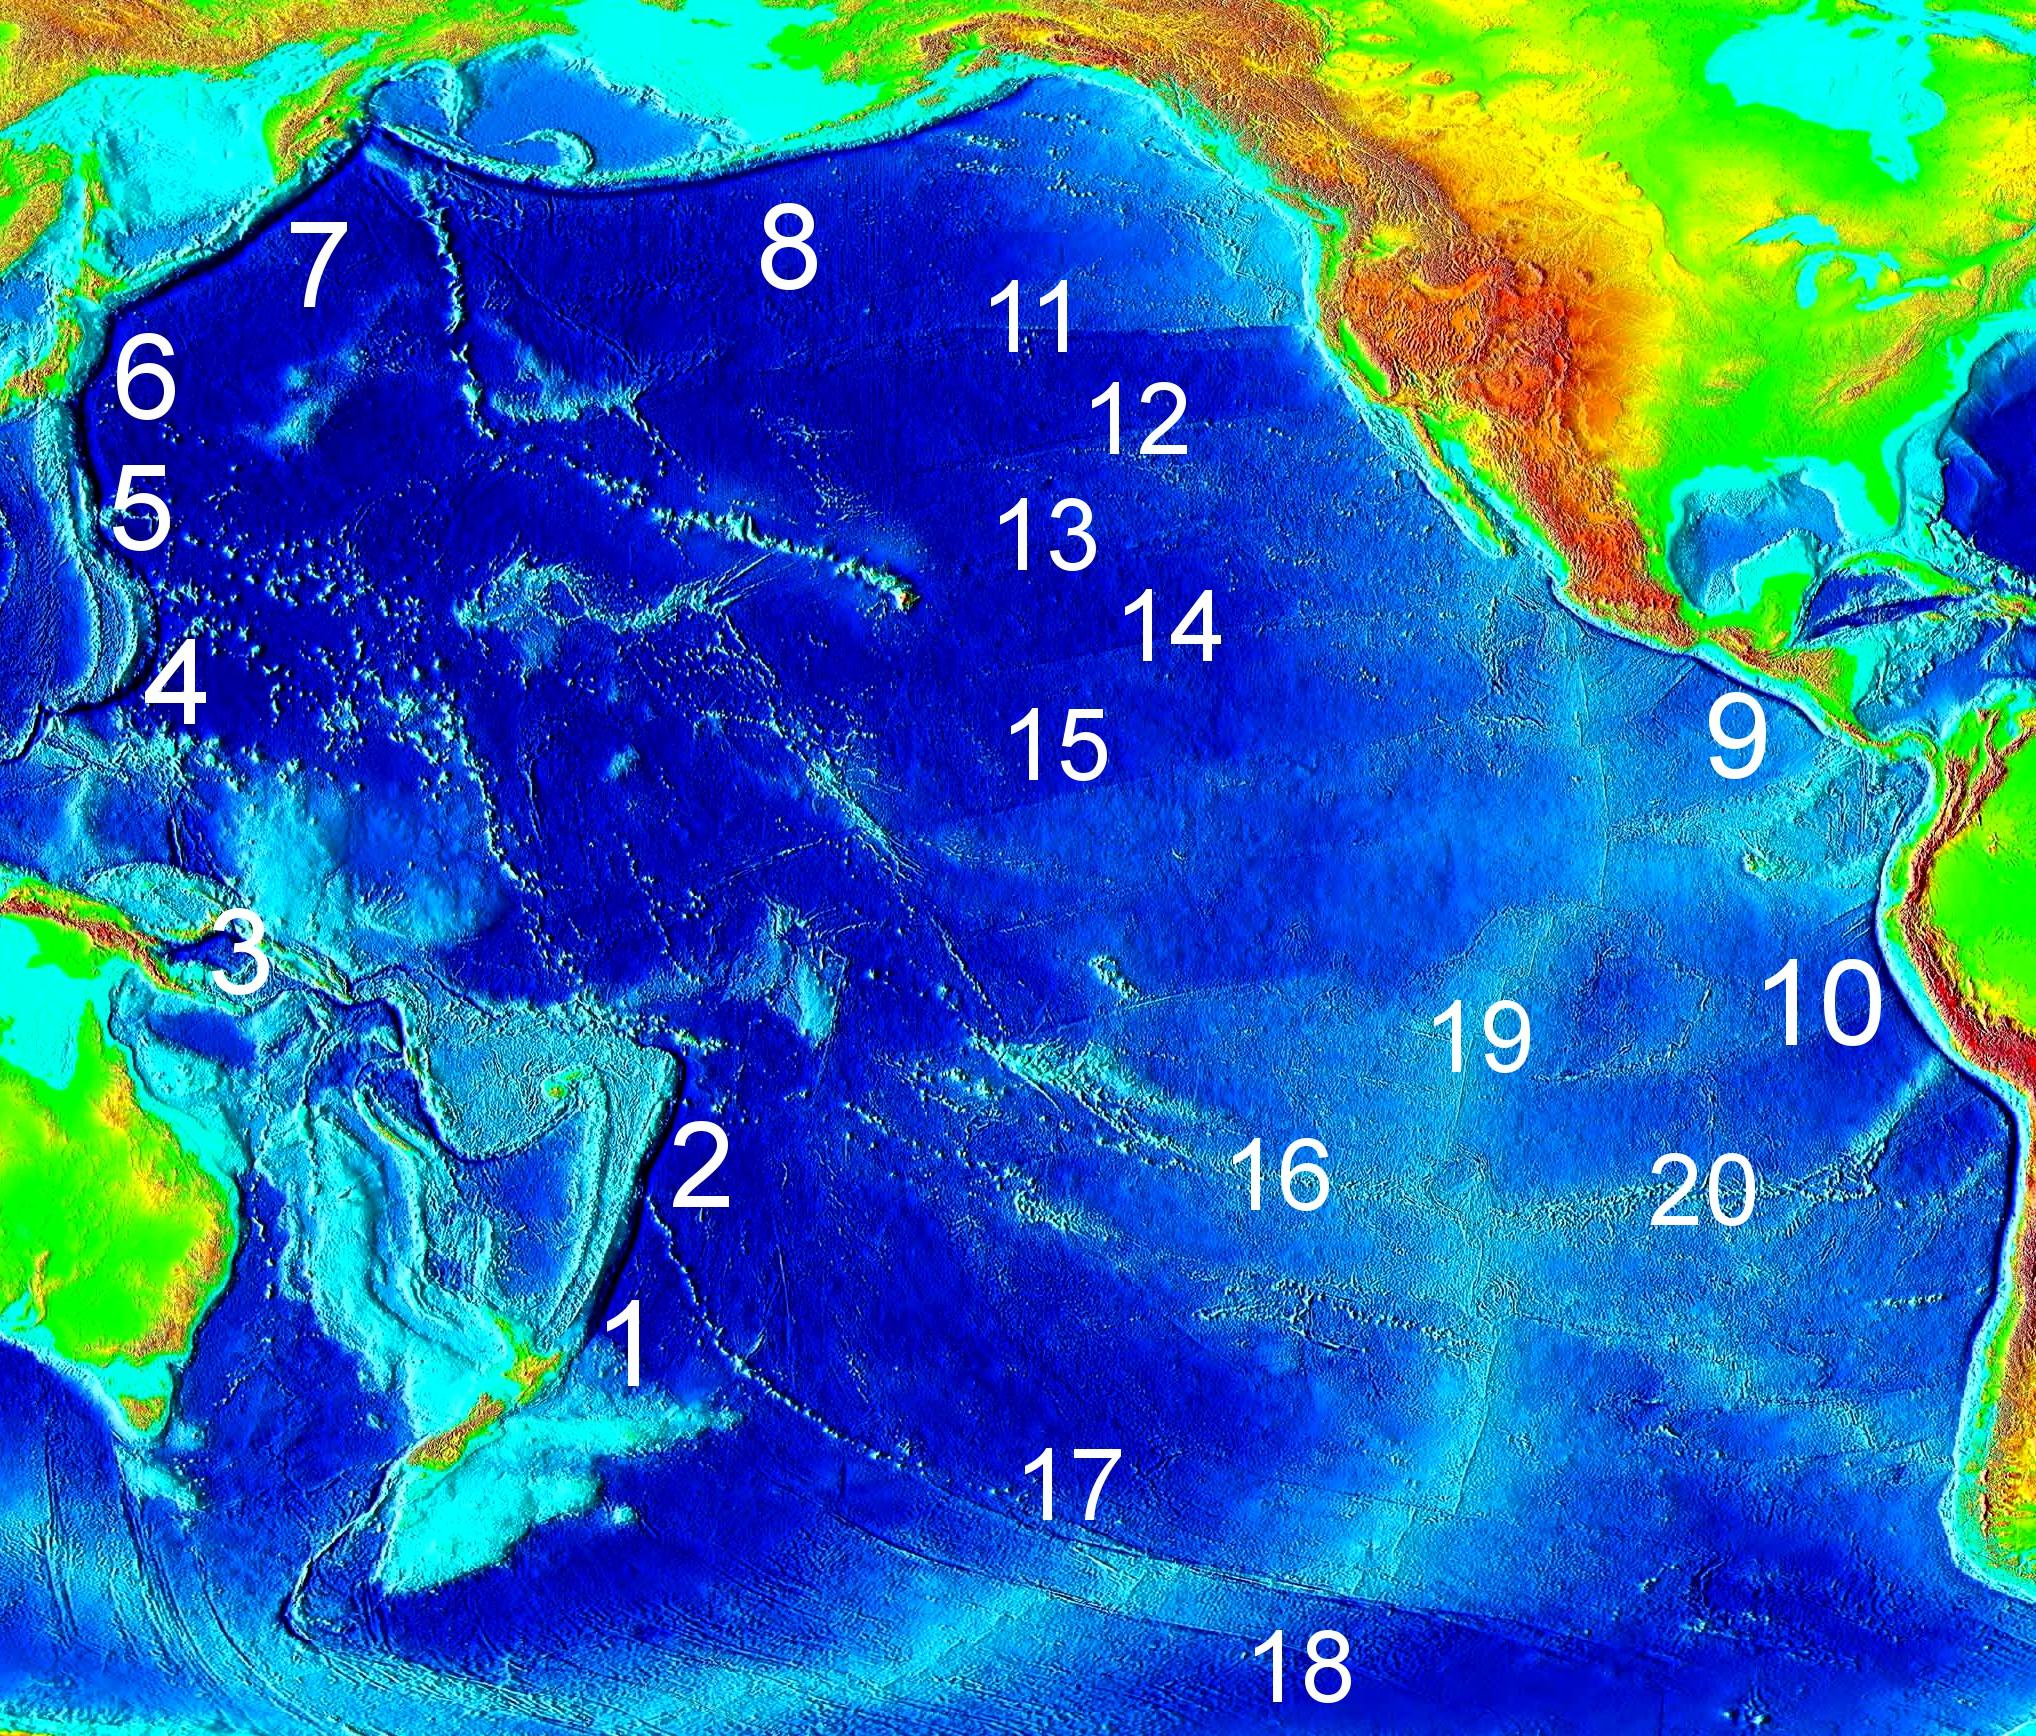 Northern Pacific Ocean On Fakebook Create A Fake Facebook - Pacific ocean depth map